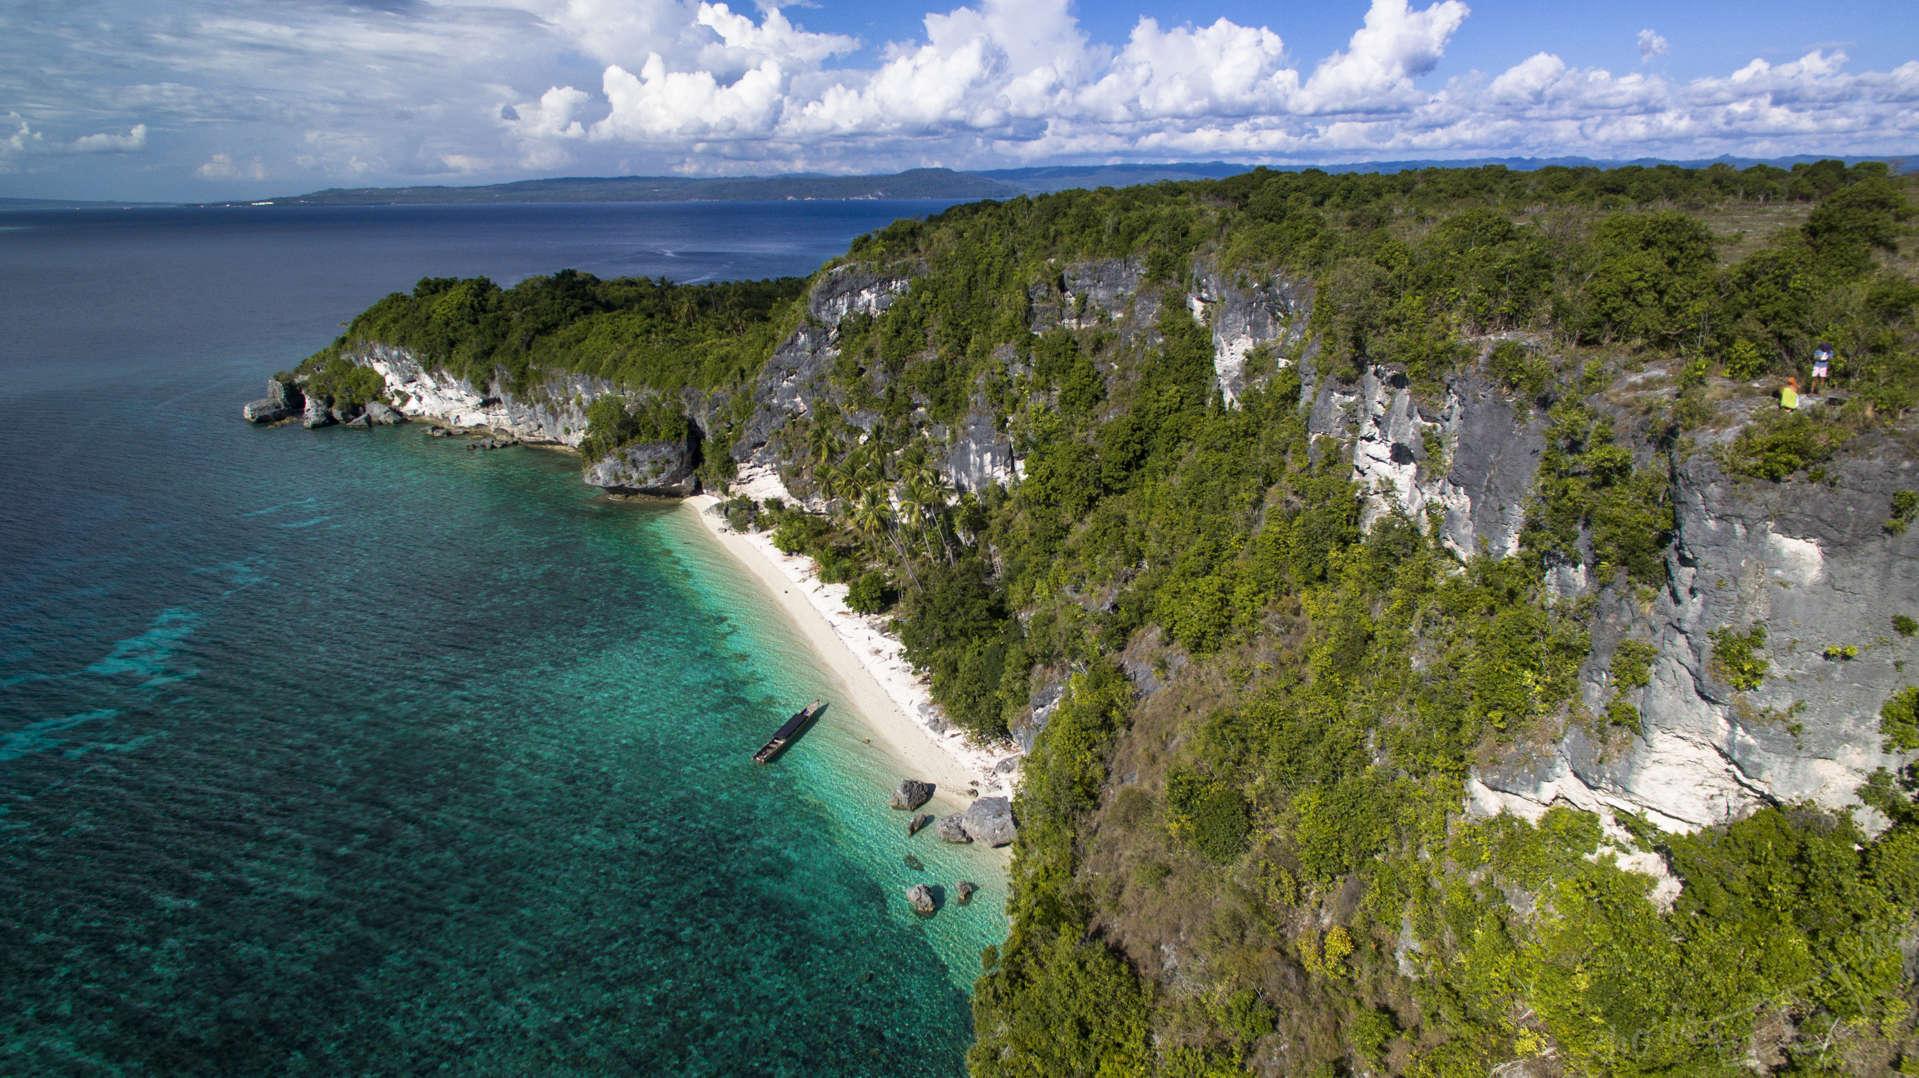 uninhabitat island indonesia, secret island indonesia, white beach secret island drone, drone indonesia